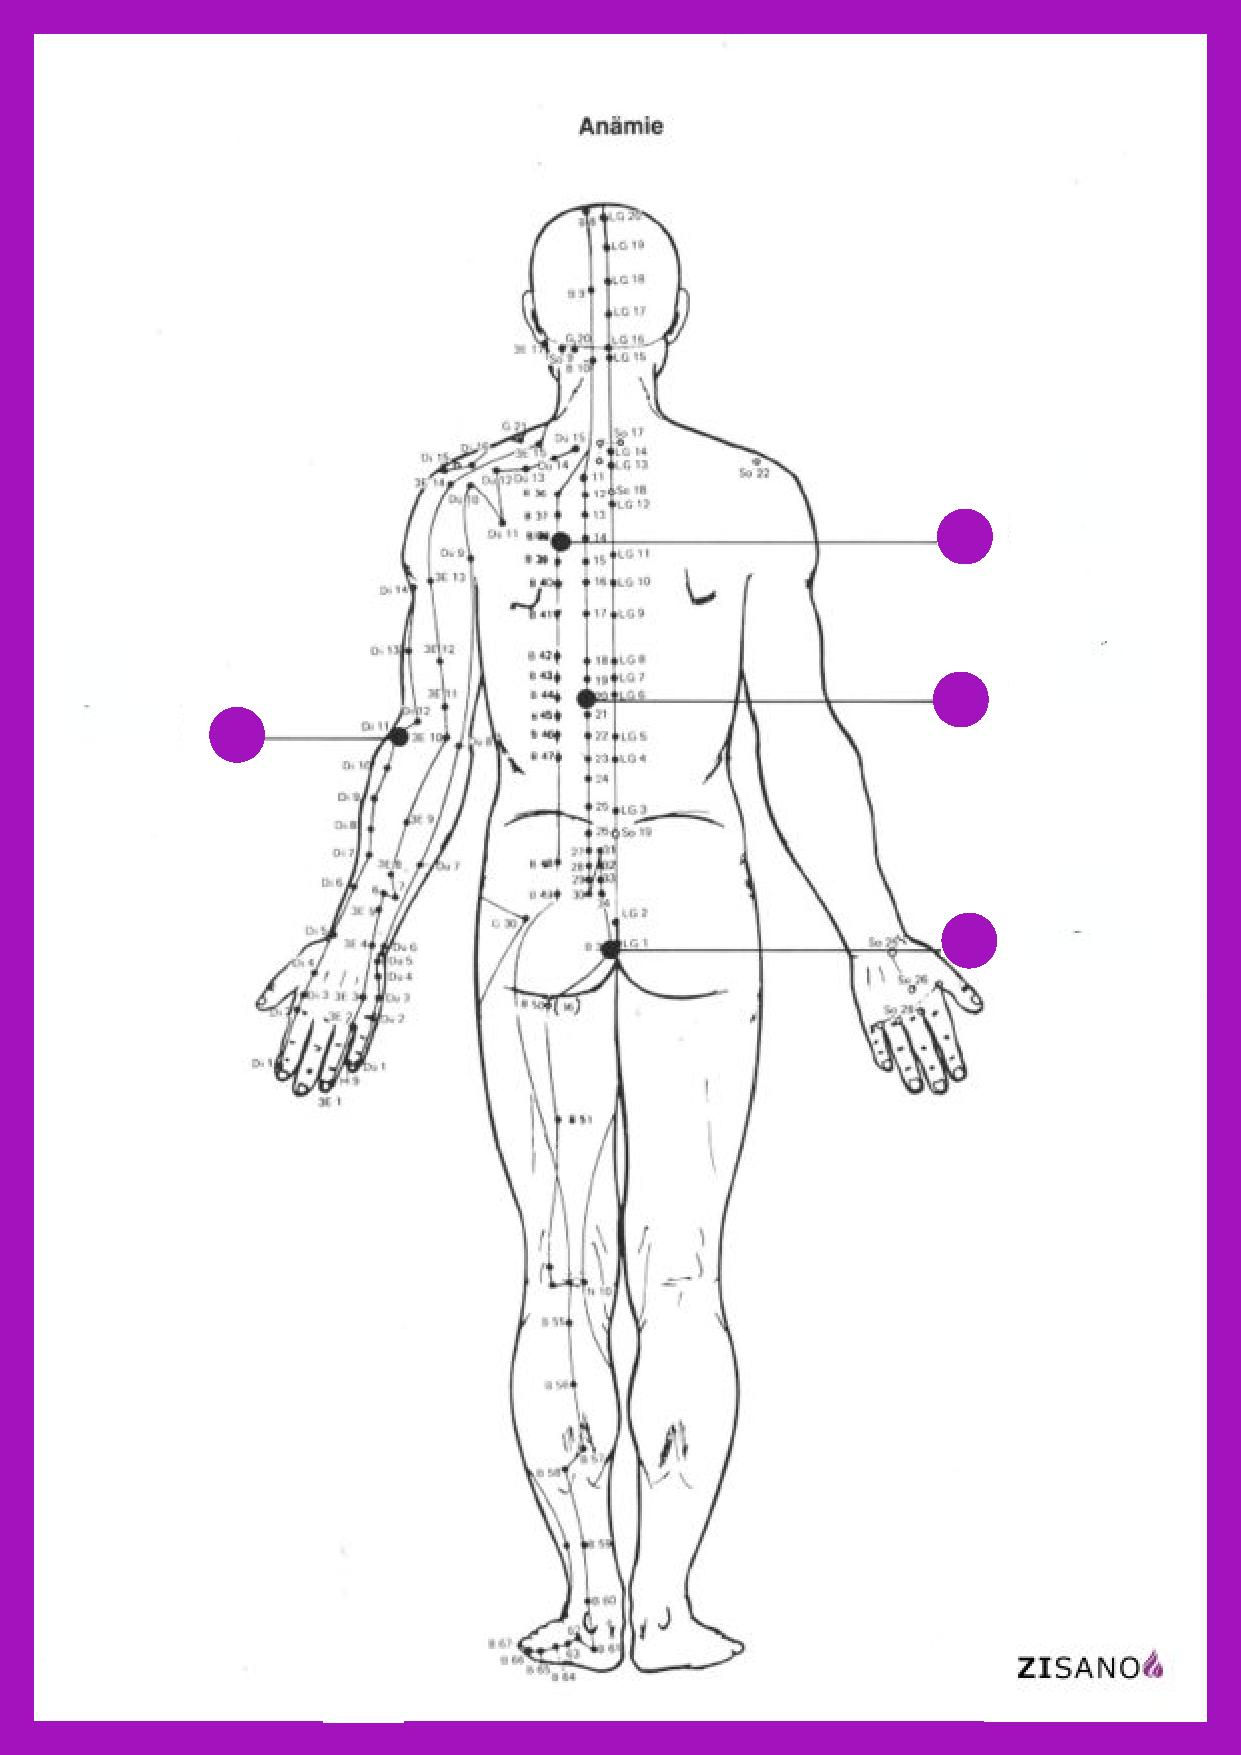 Meridiane - Anaemie - Therapie